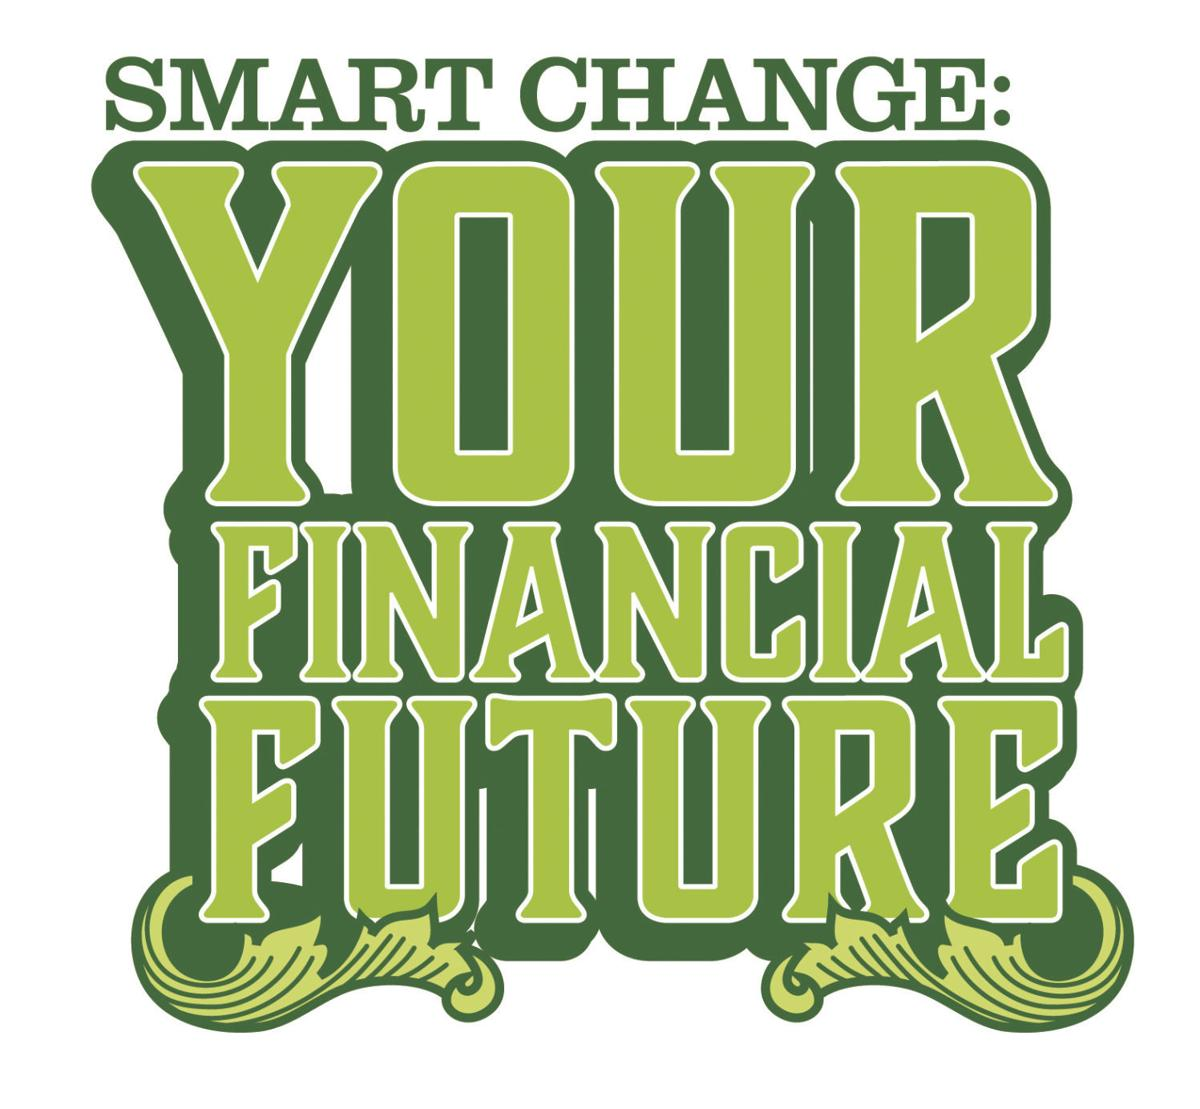 Smart Change logo